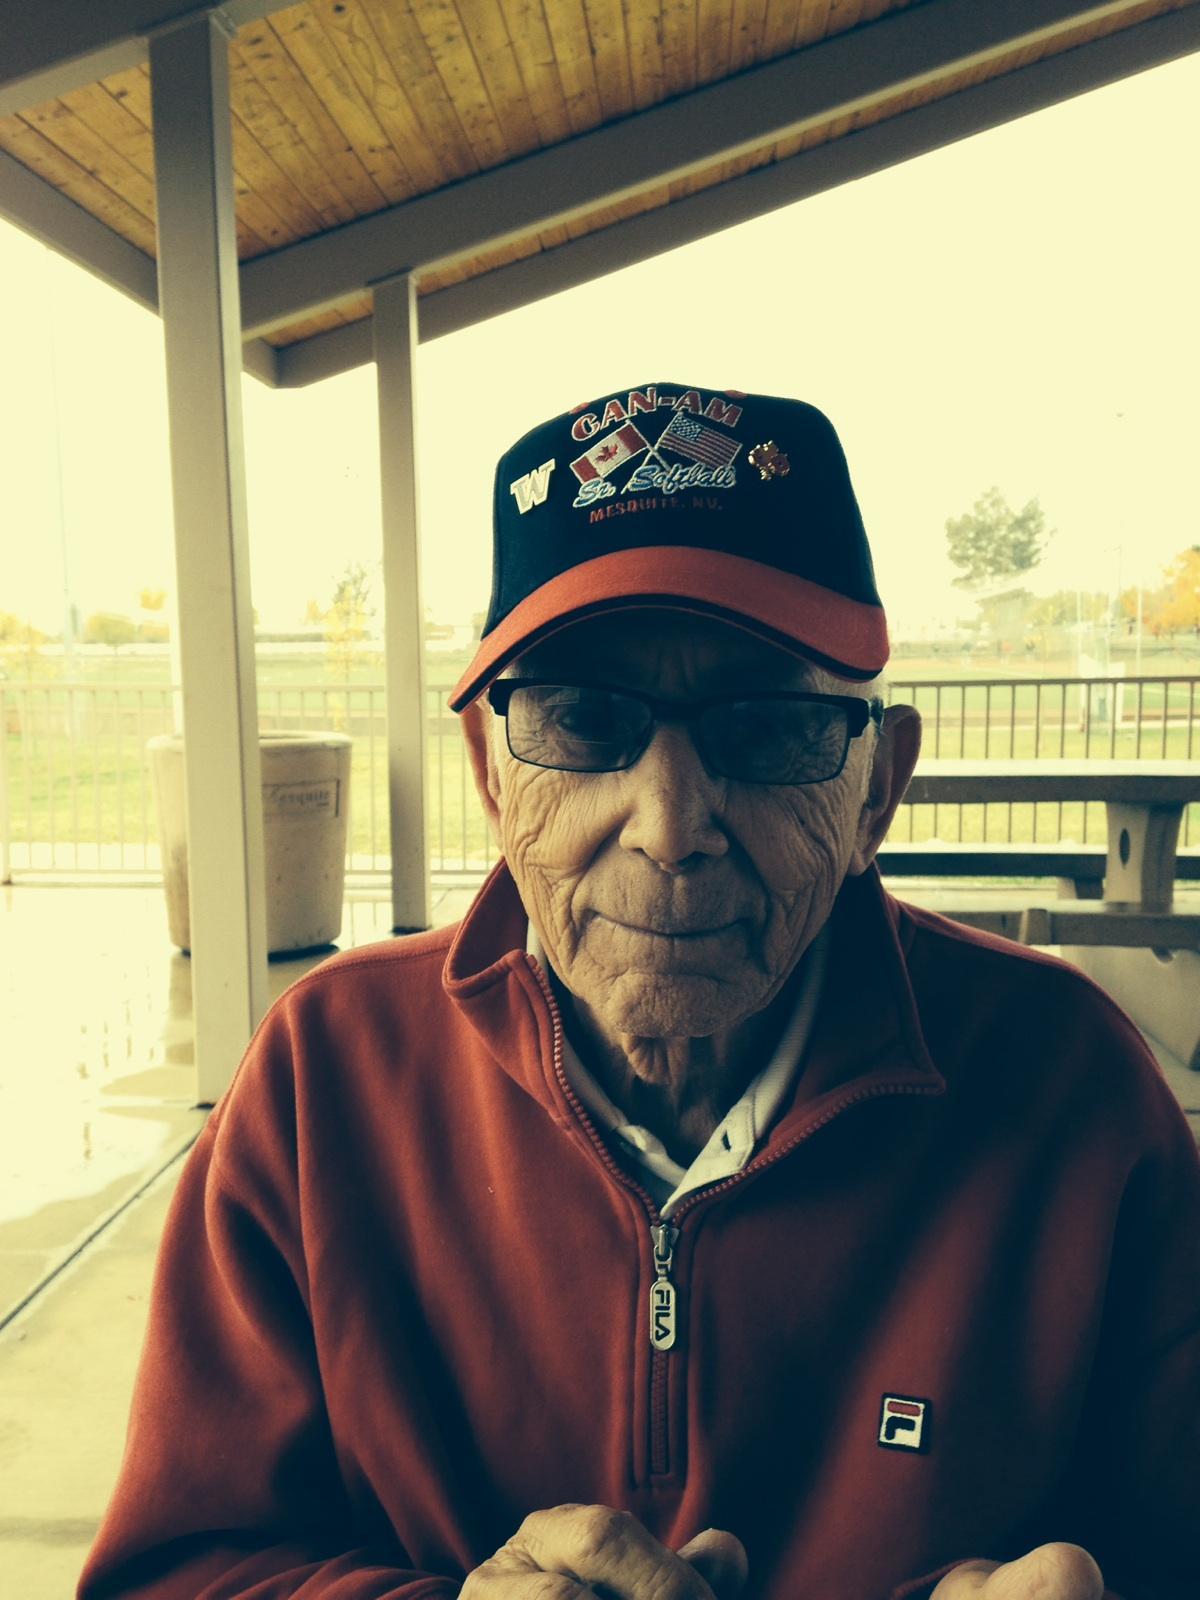 'Mr. Softball' Frank Pati retiring